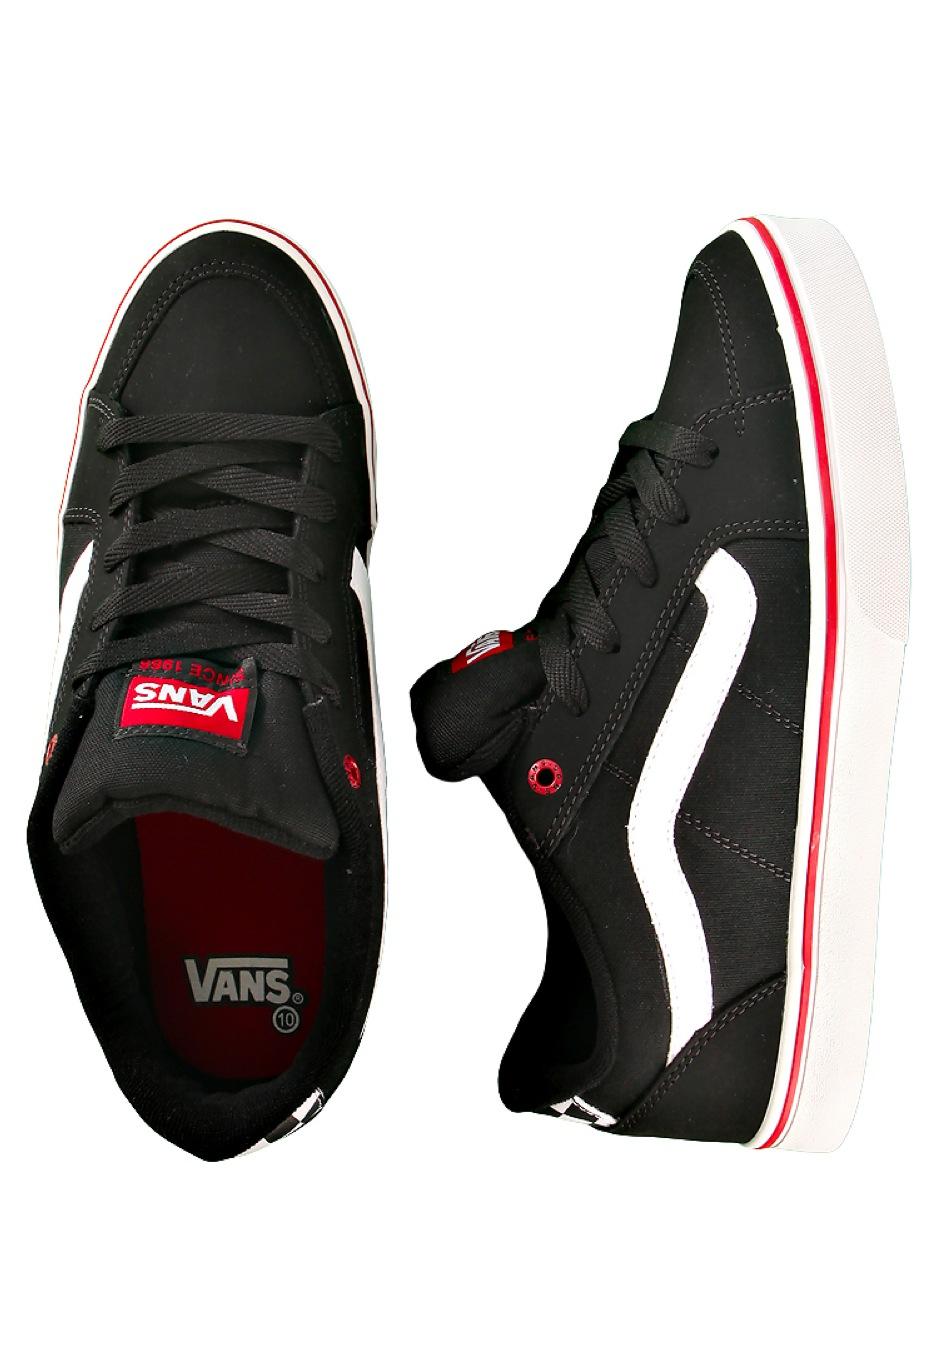 12e767d4f188 Vans - Transistor Black White - Shoes - Impericon.com Worldwide